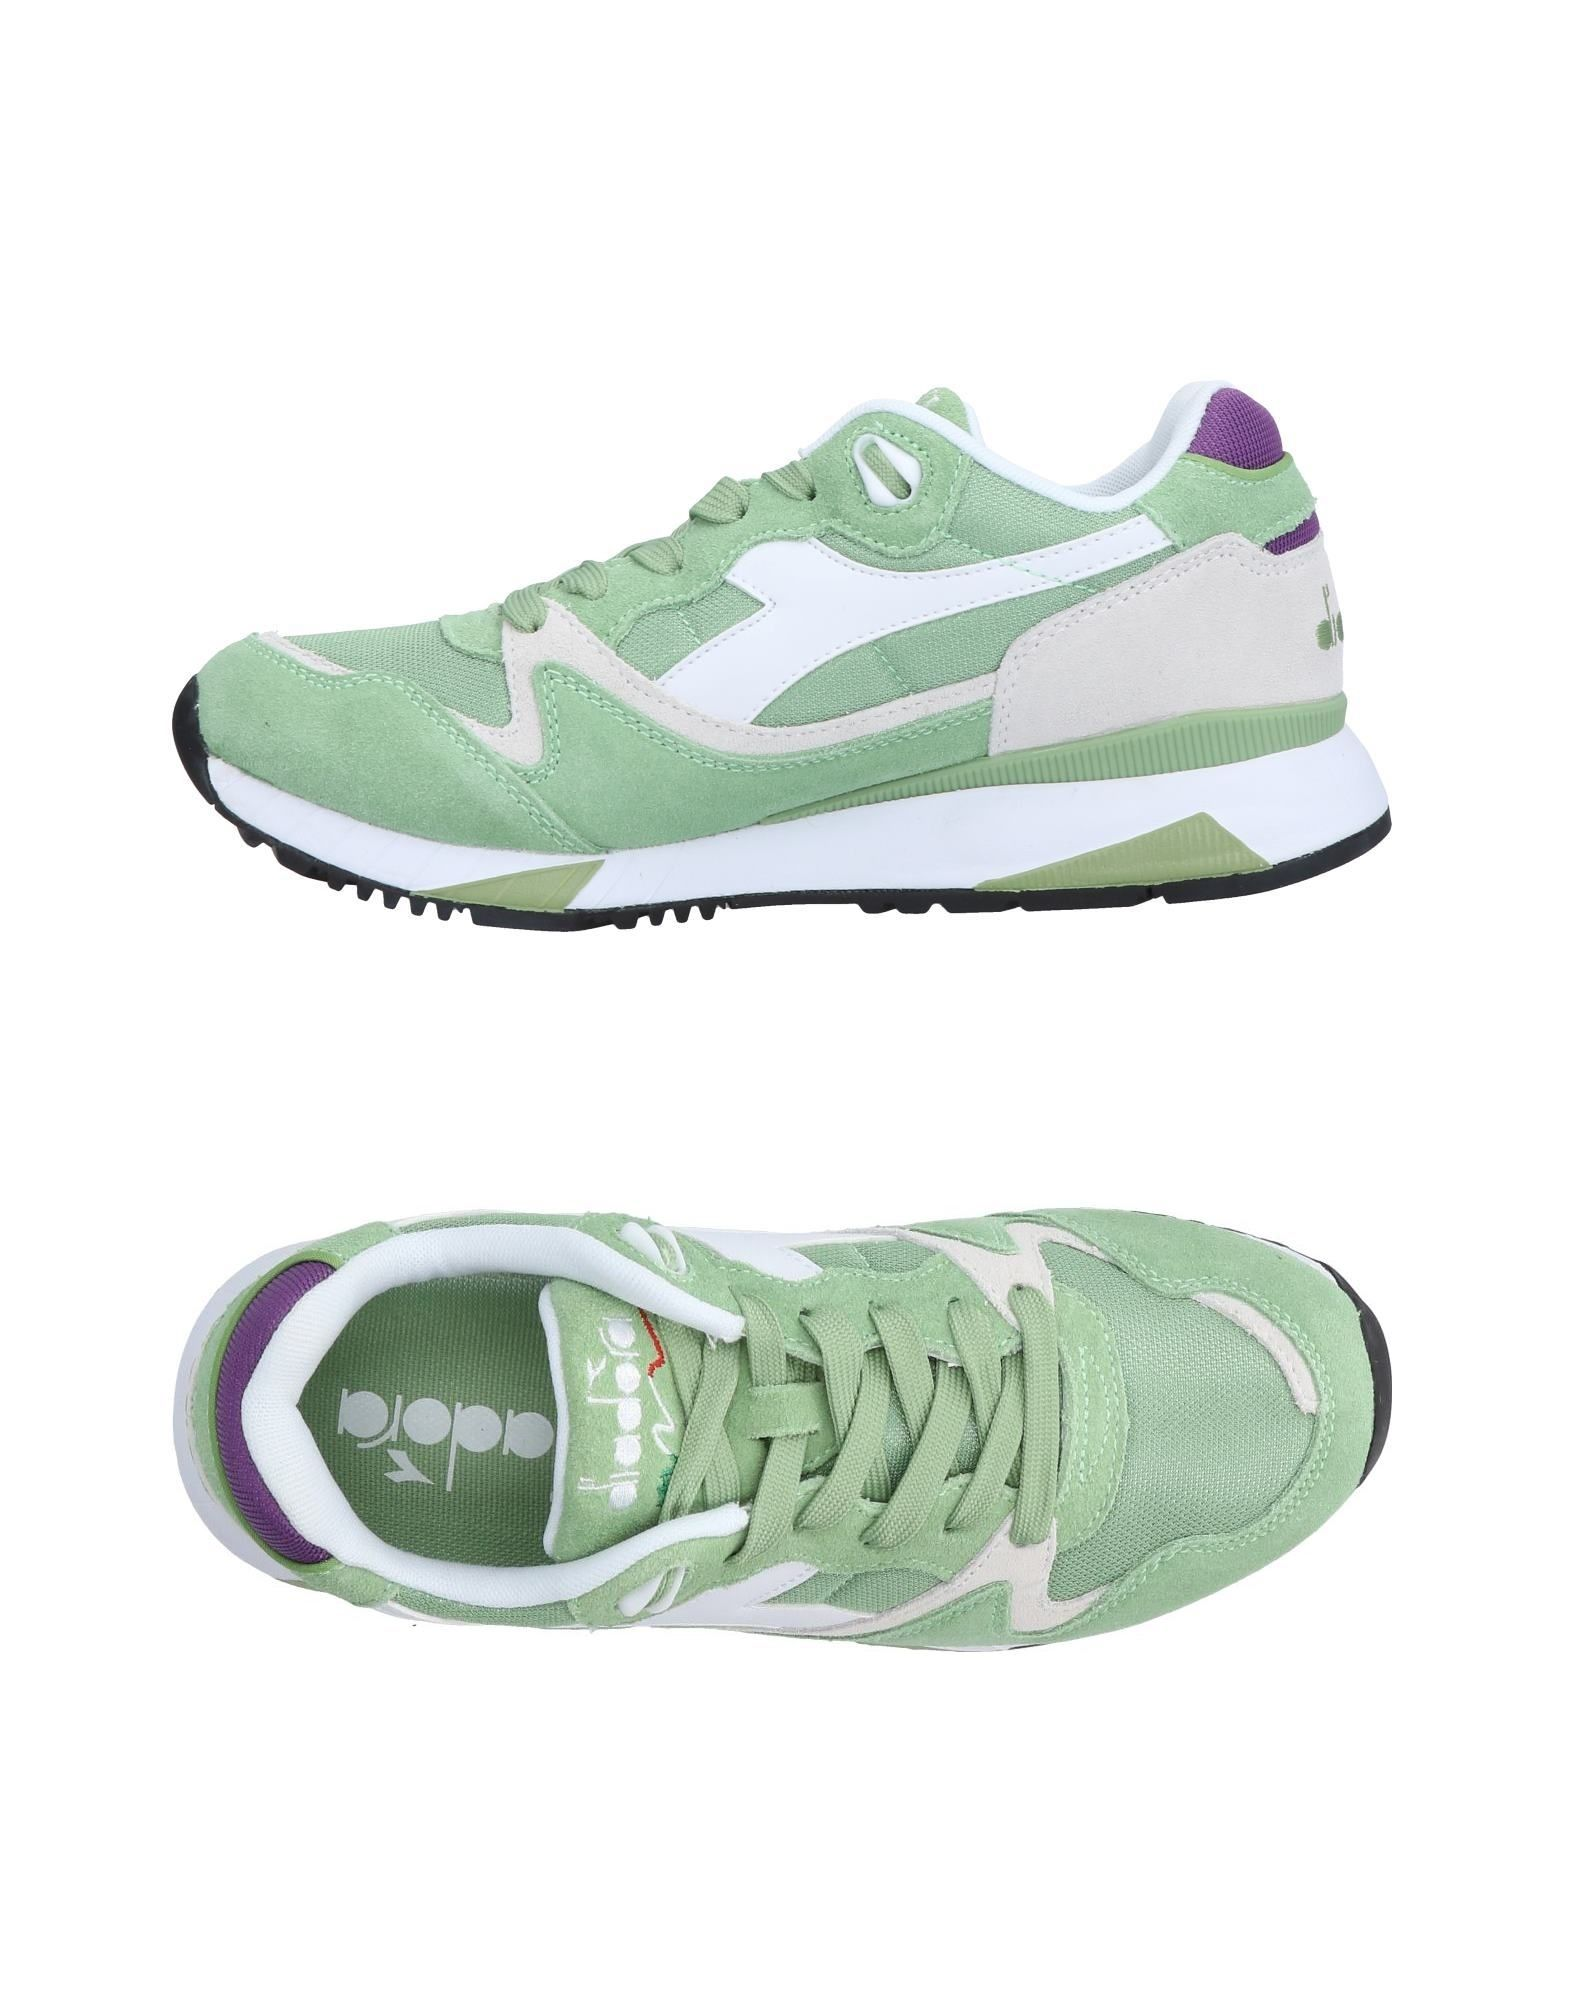 Diadora Sneakers Sneakers Sneakers - Women Diadora Sneakers online on  United Kingdom - 11472103KG 33c2ab